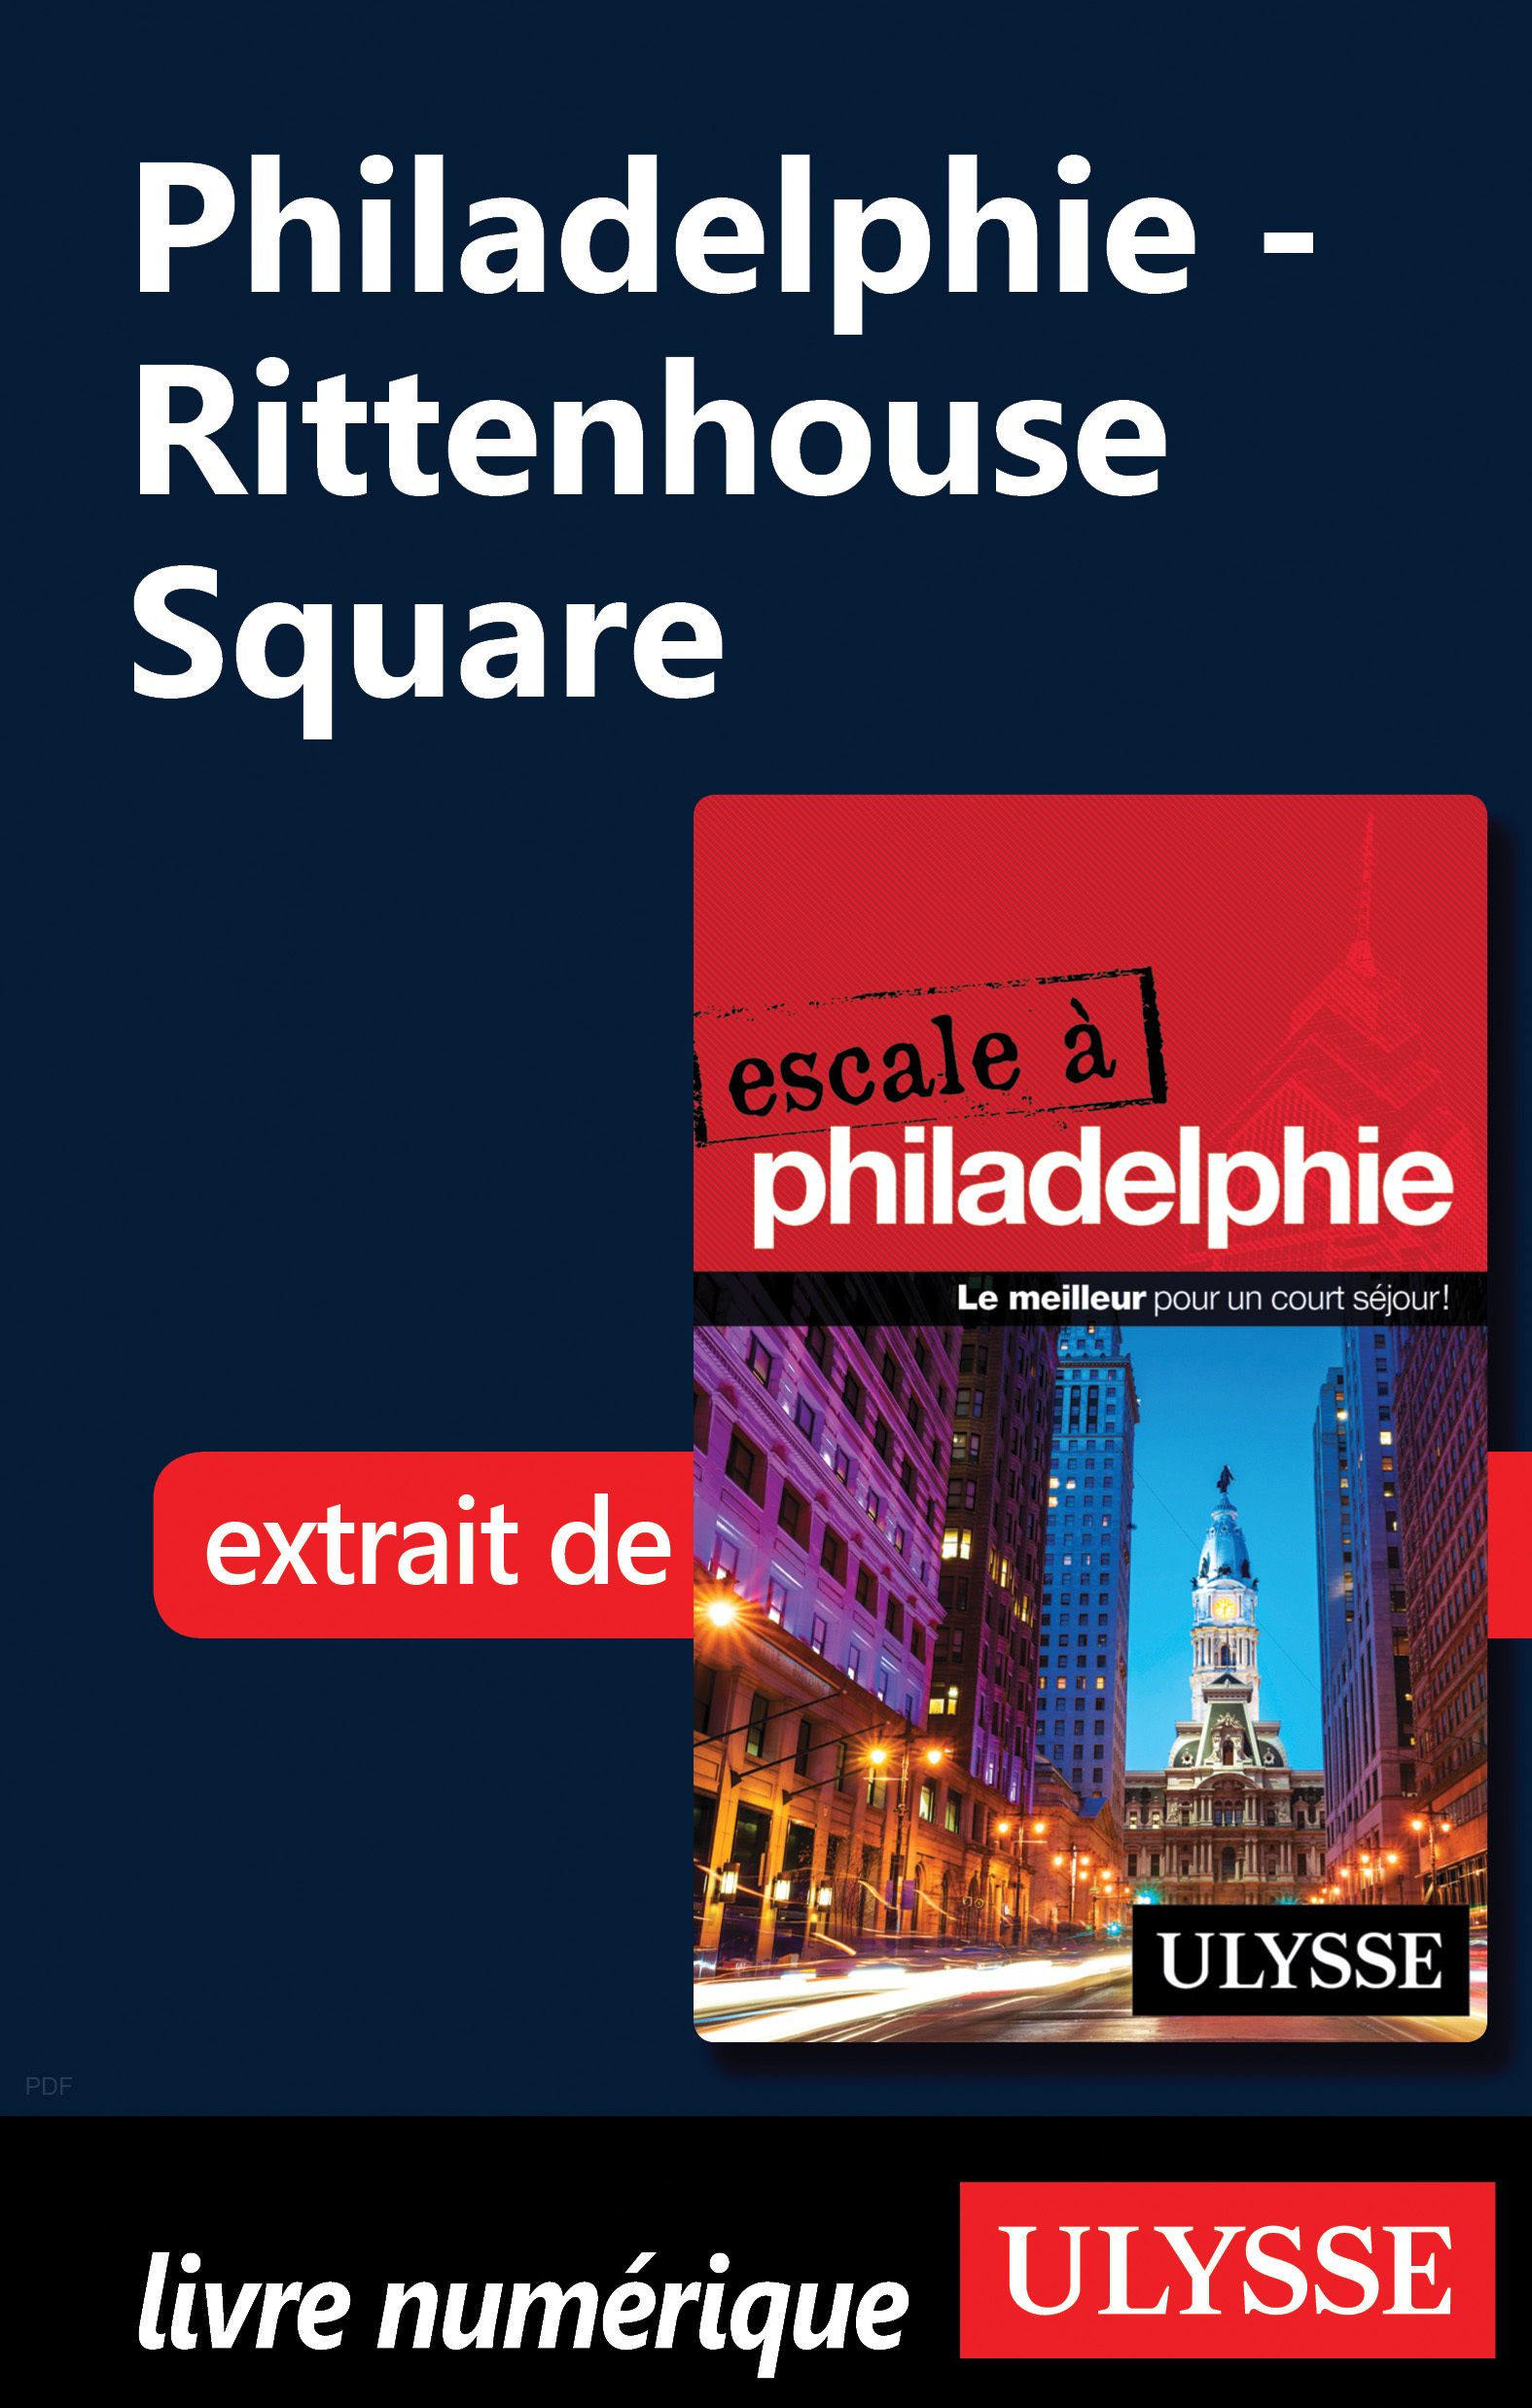 Philadelphie - Rittenhouse Square